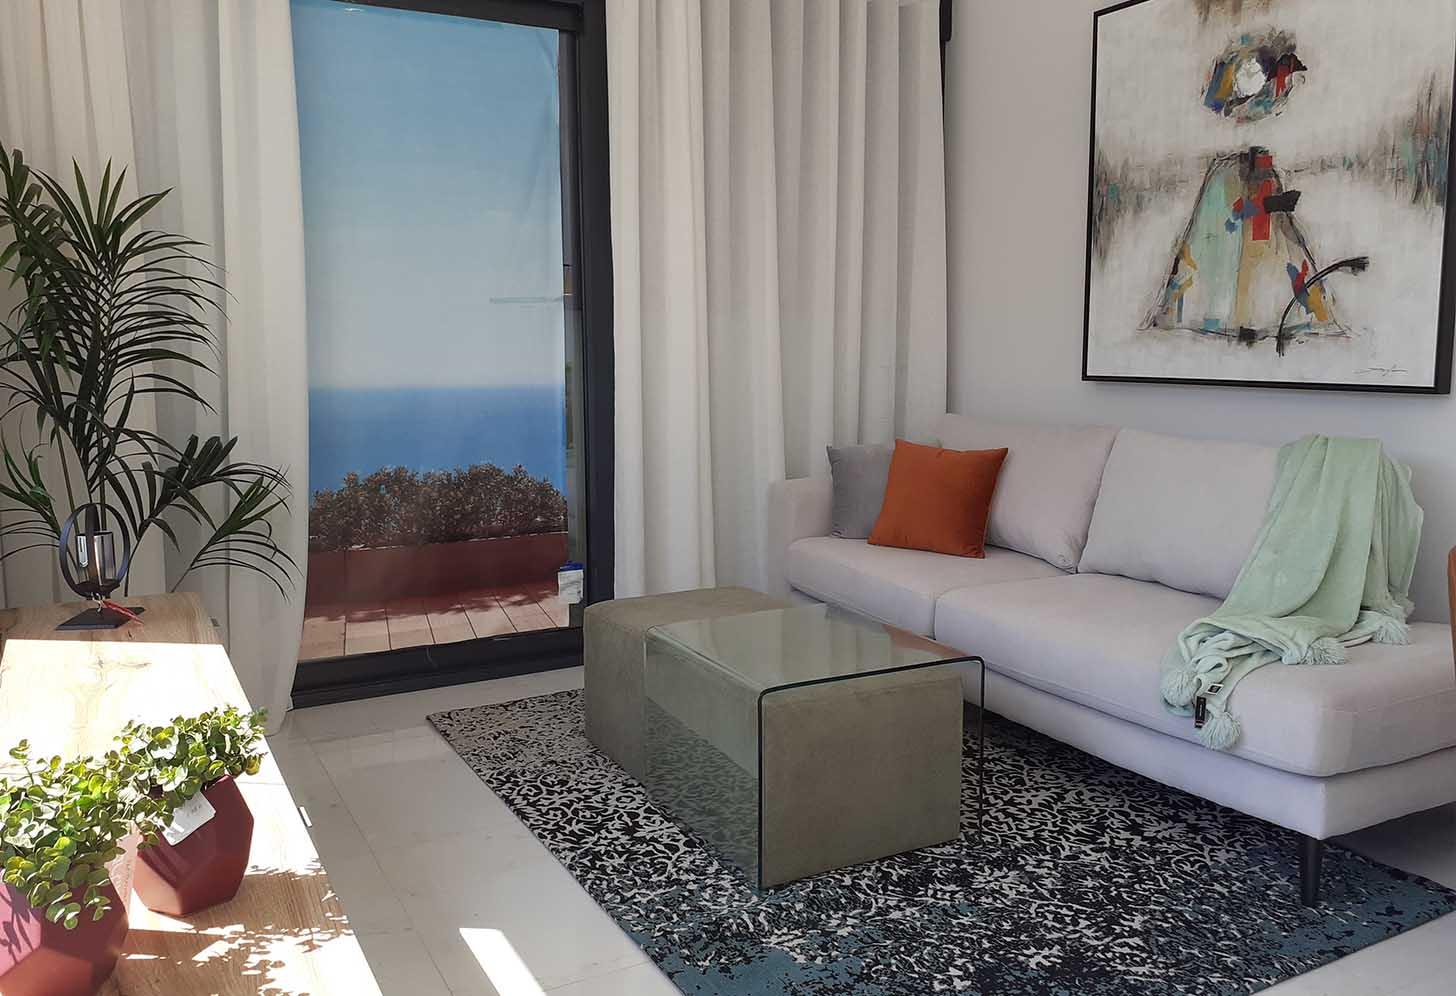 immobilier neuf espagne costa blanca on-m2 benidorm beach salon